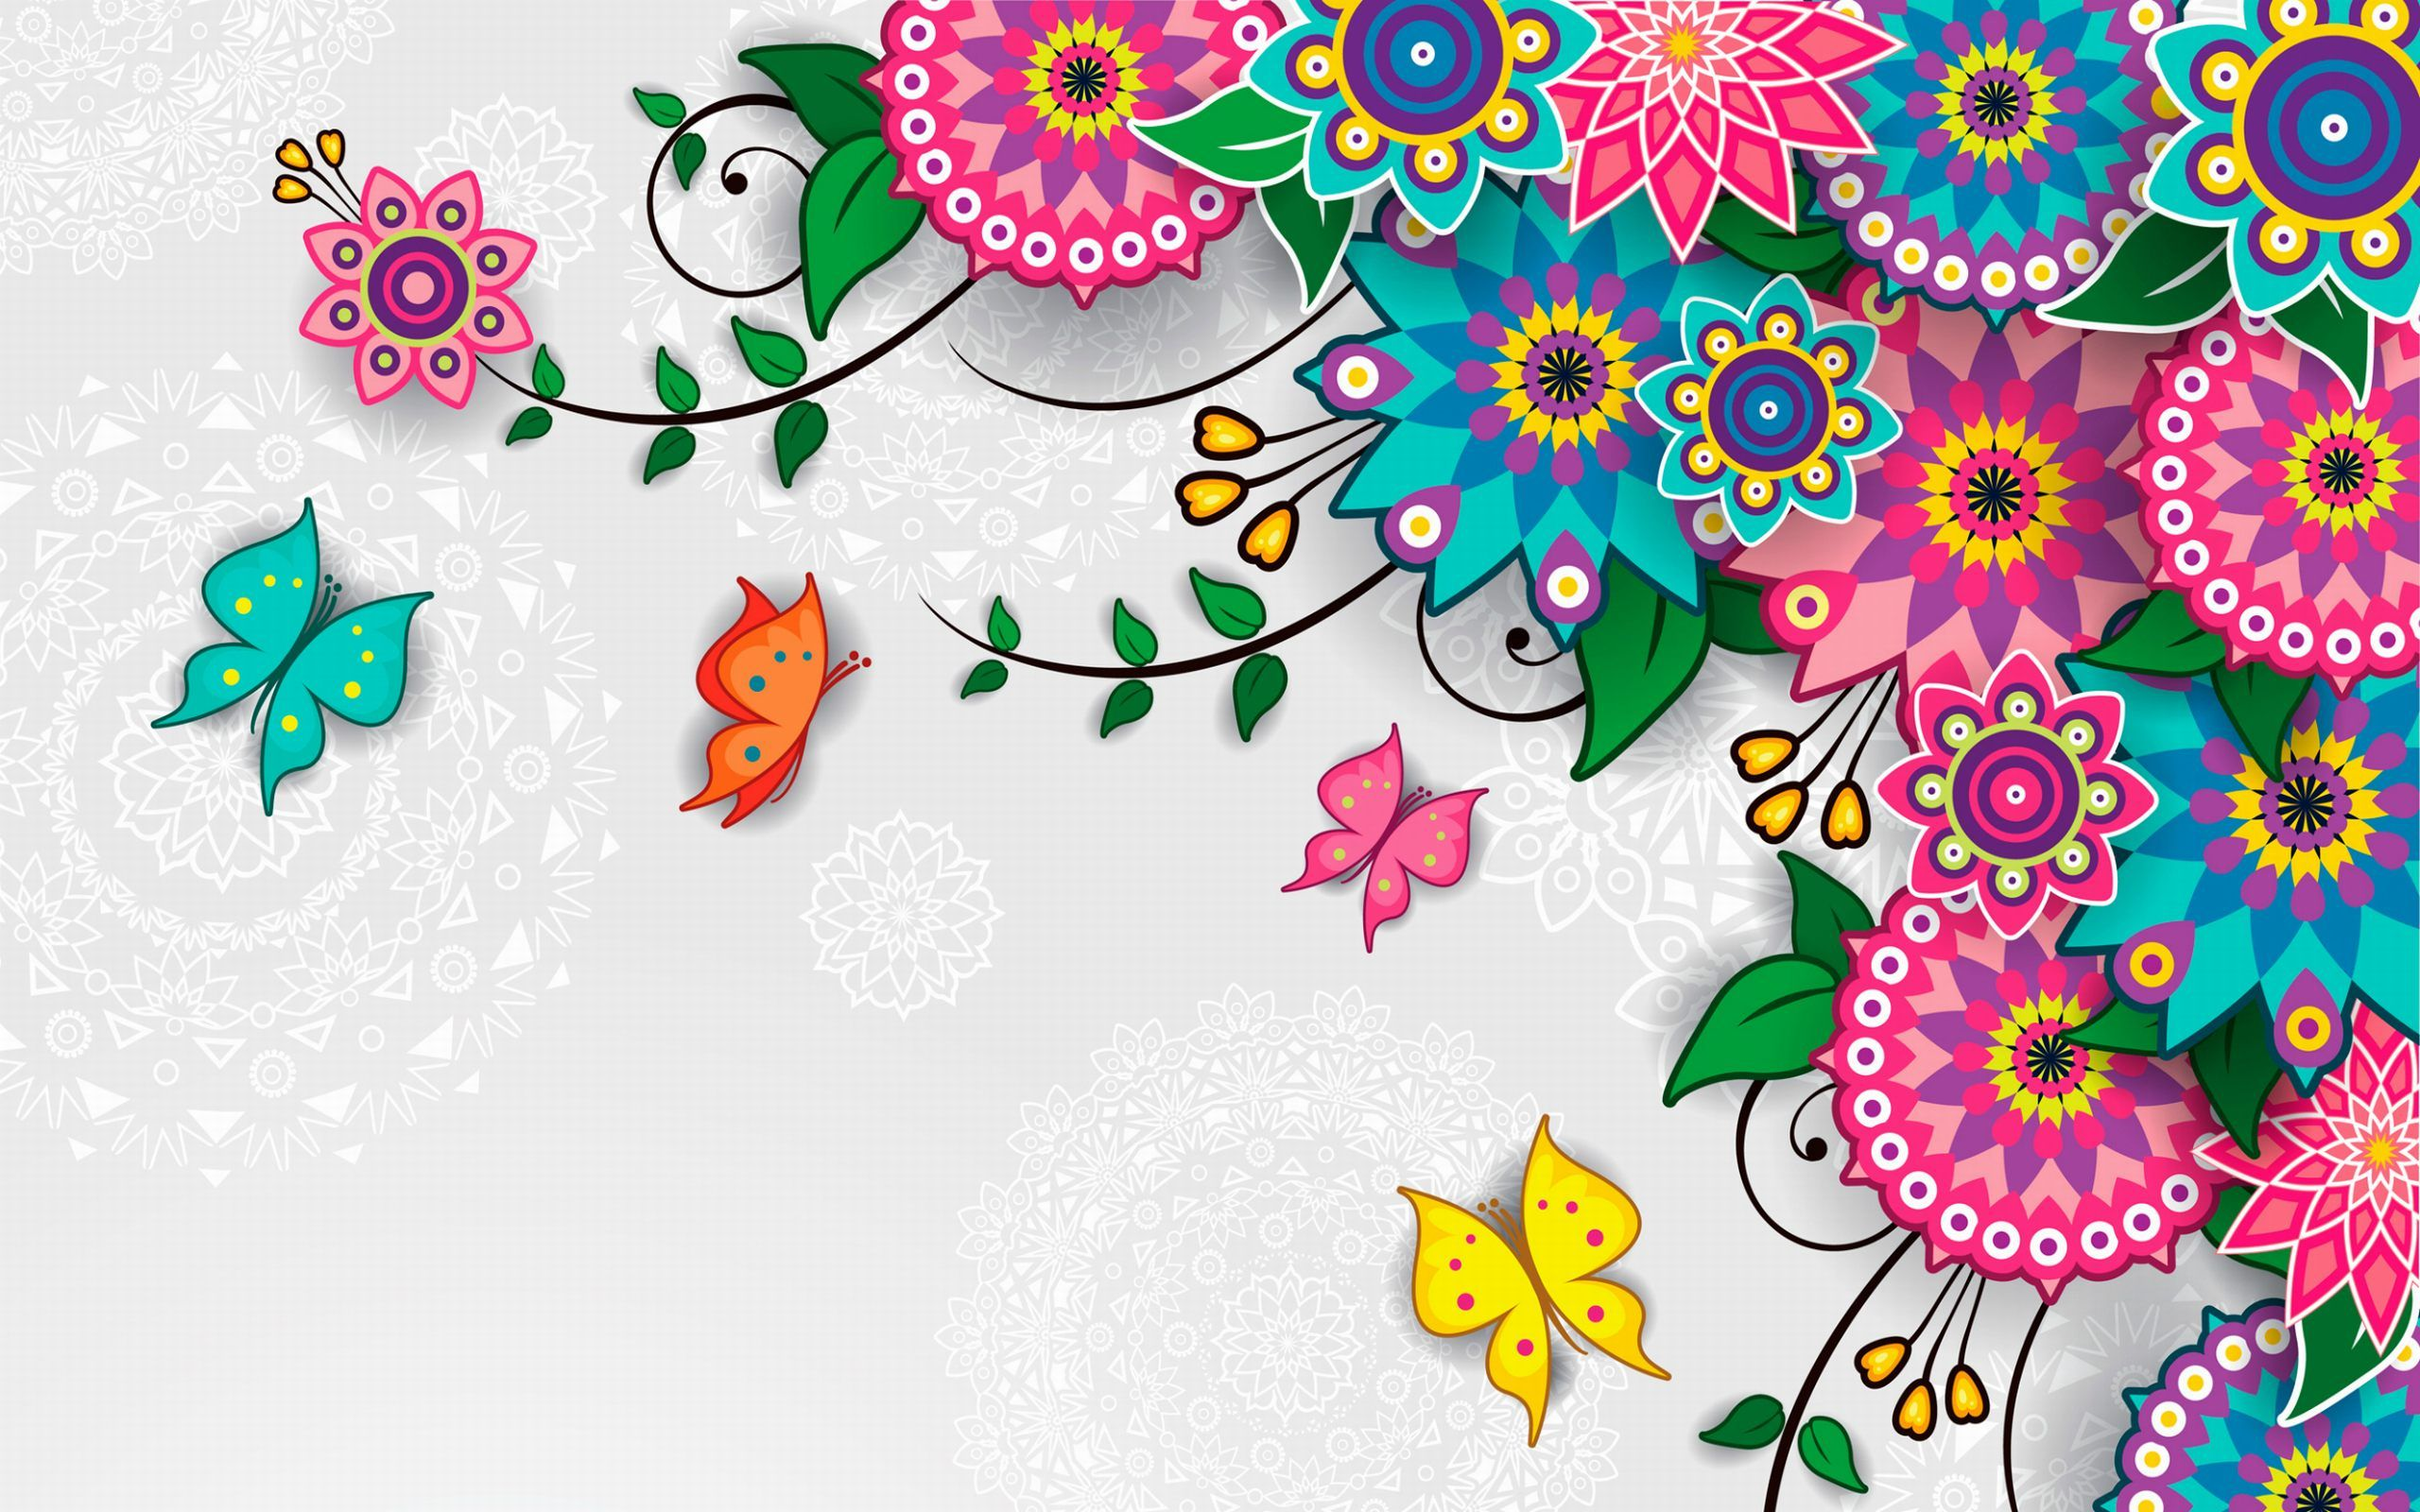 2560x1600 Flowers Pattern Vector Art Background Wallpaper Wallpaper